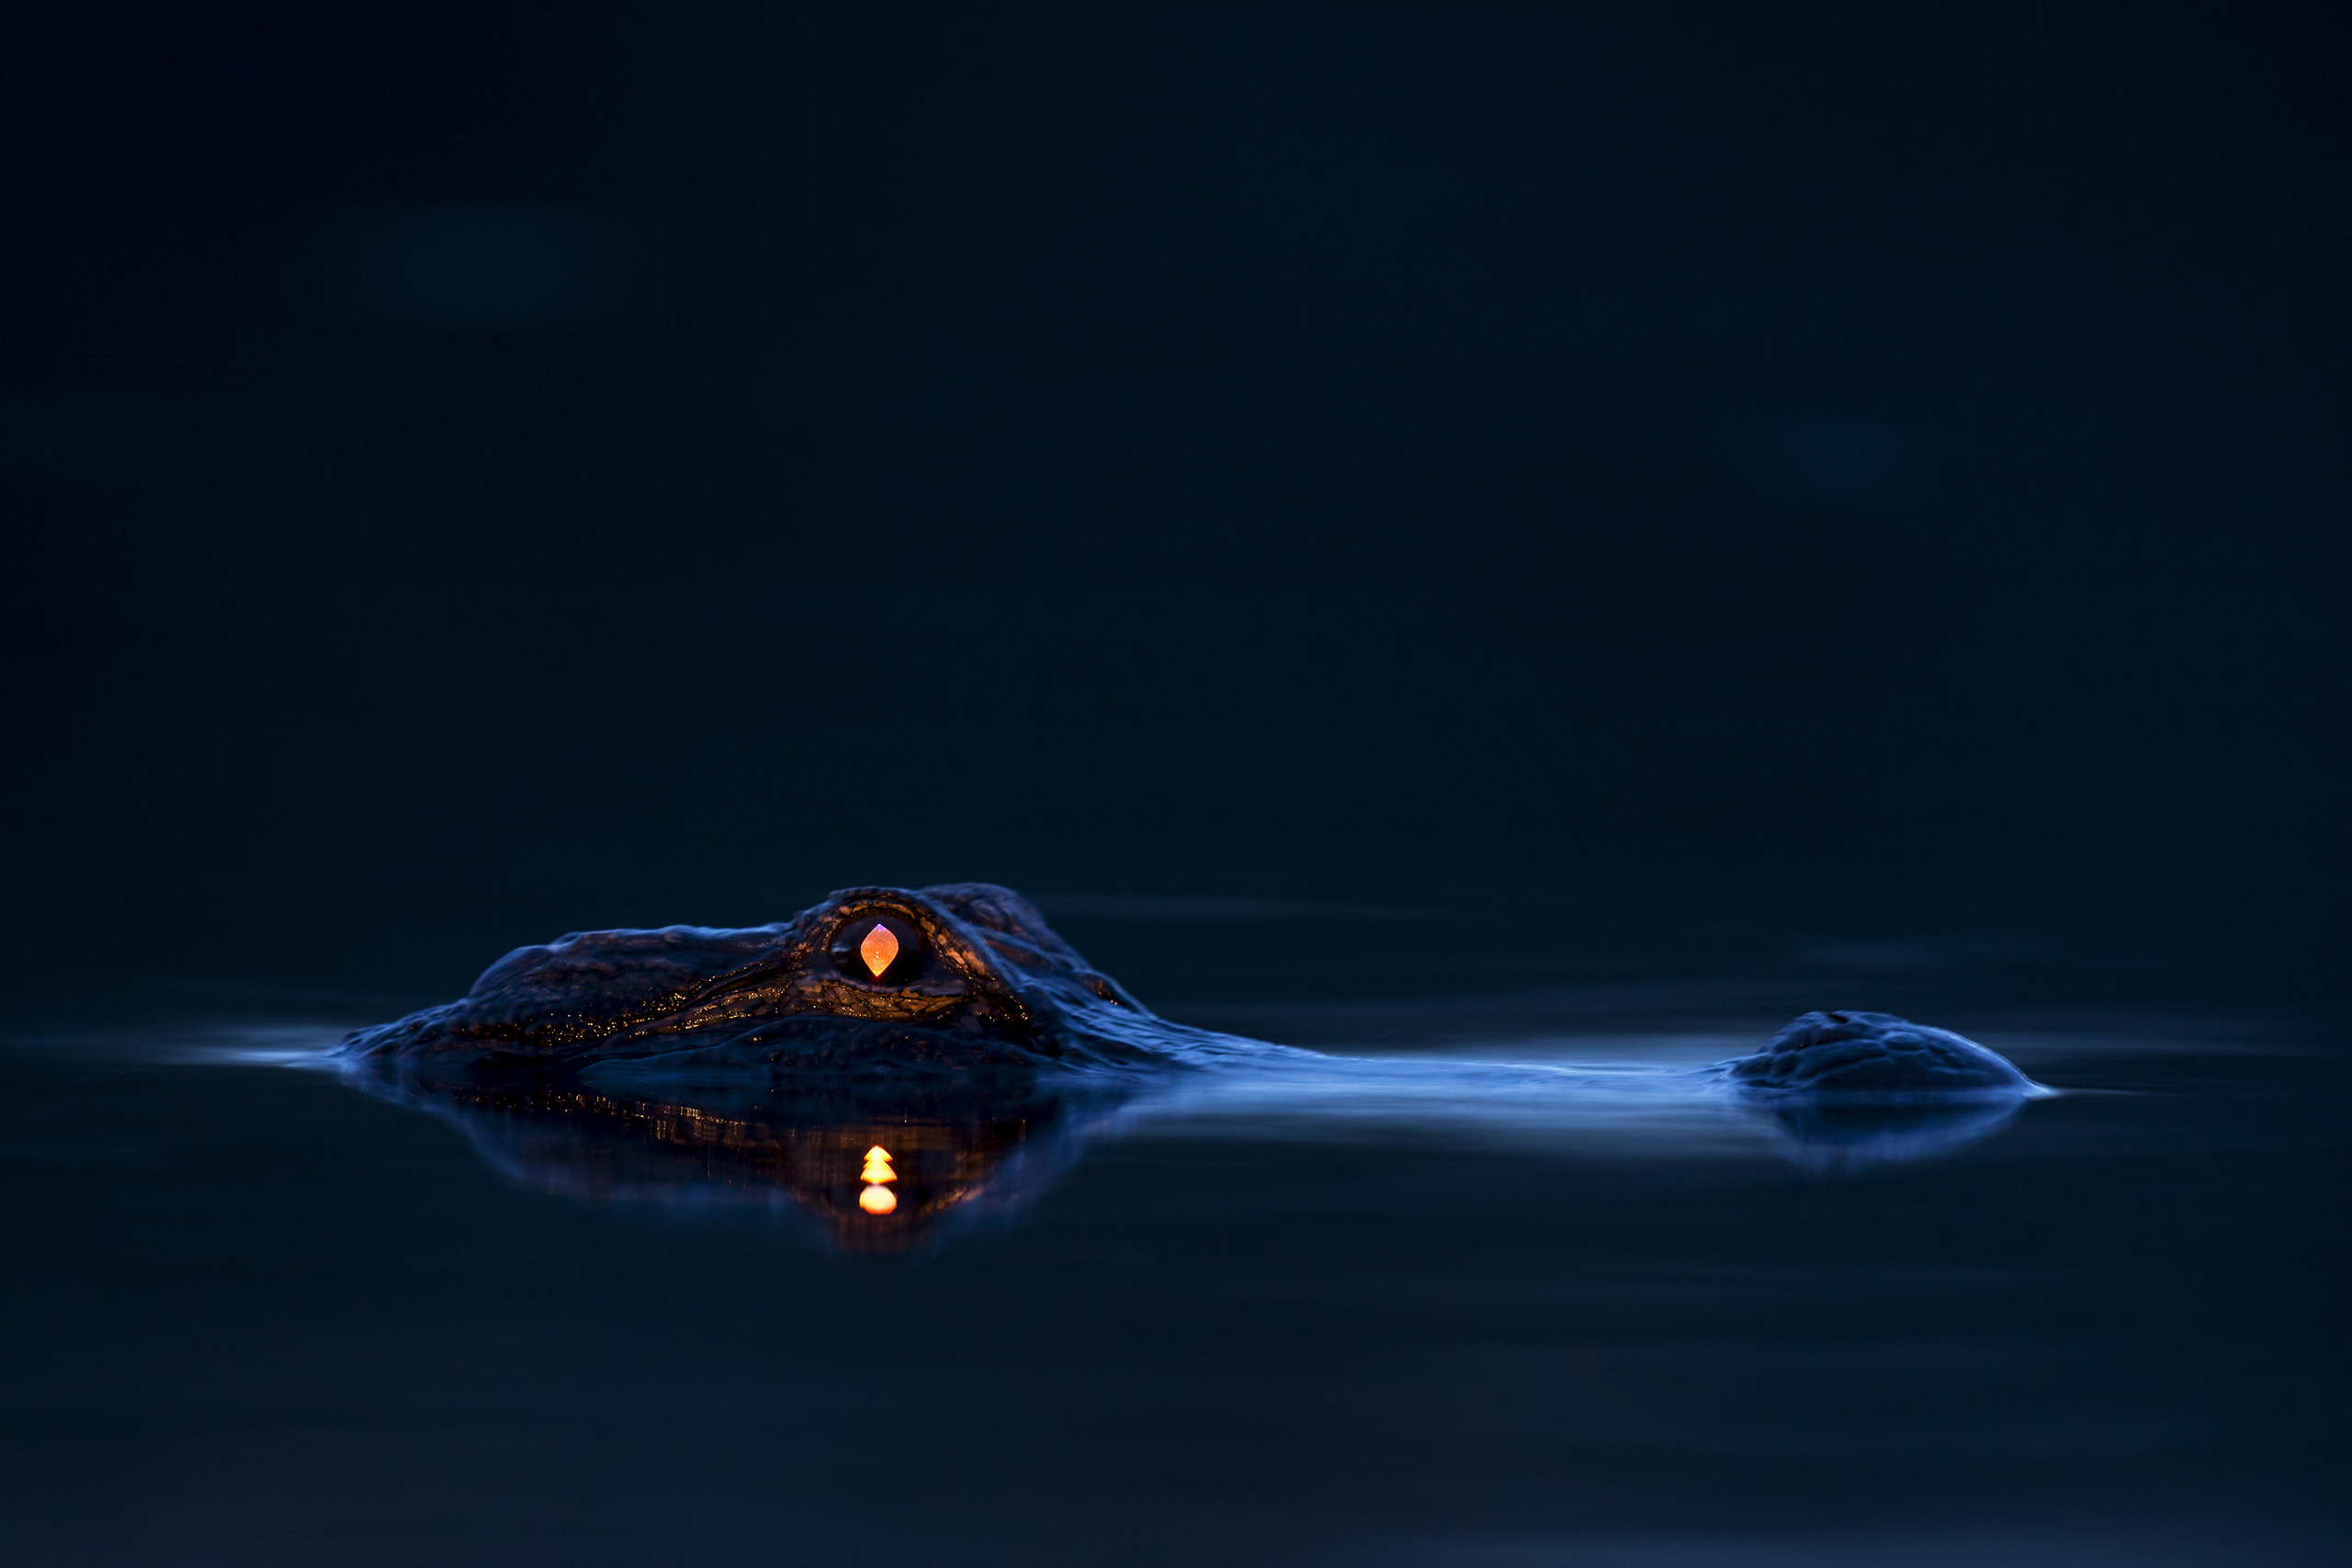 Alligator eyeshine, Myakka River State Park, Sarasota, Fla, 2014.